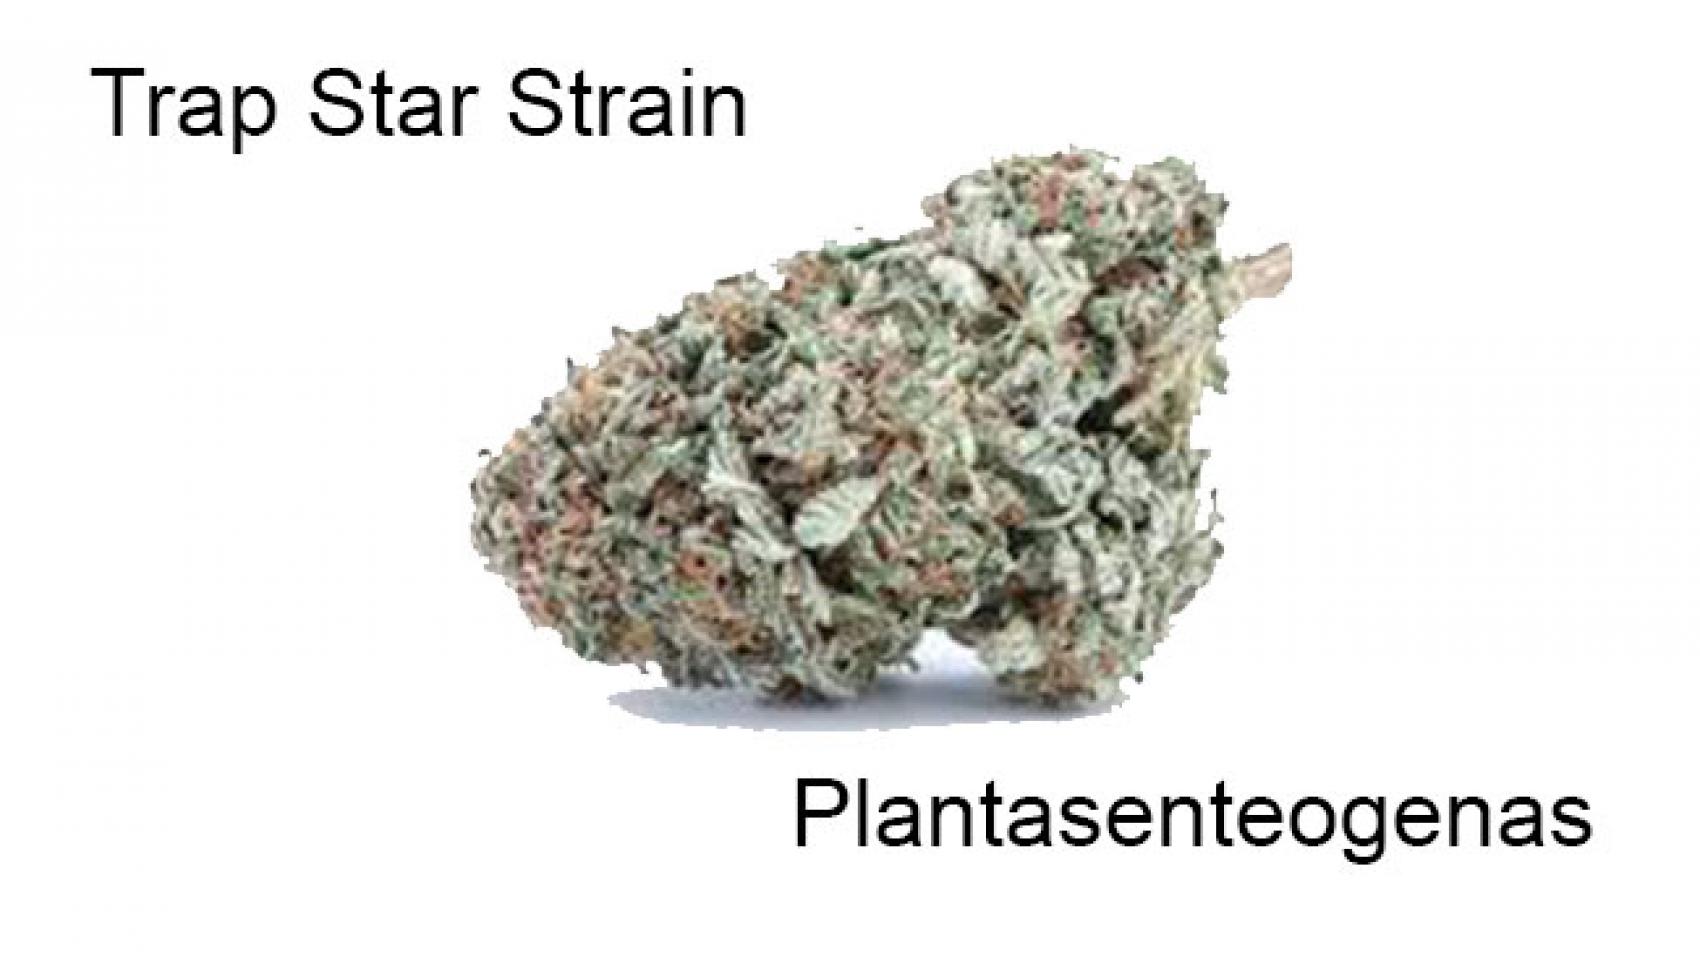 Trap Star Strain